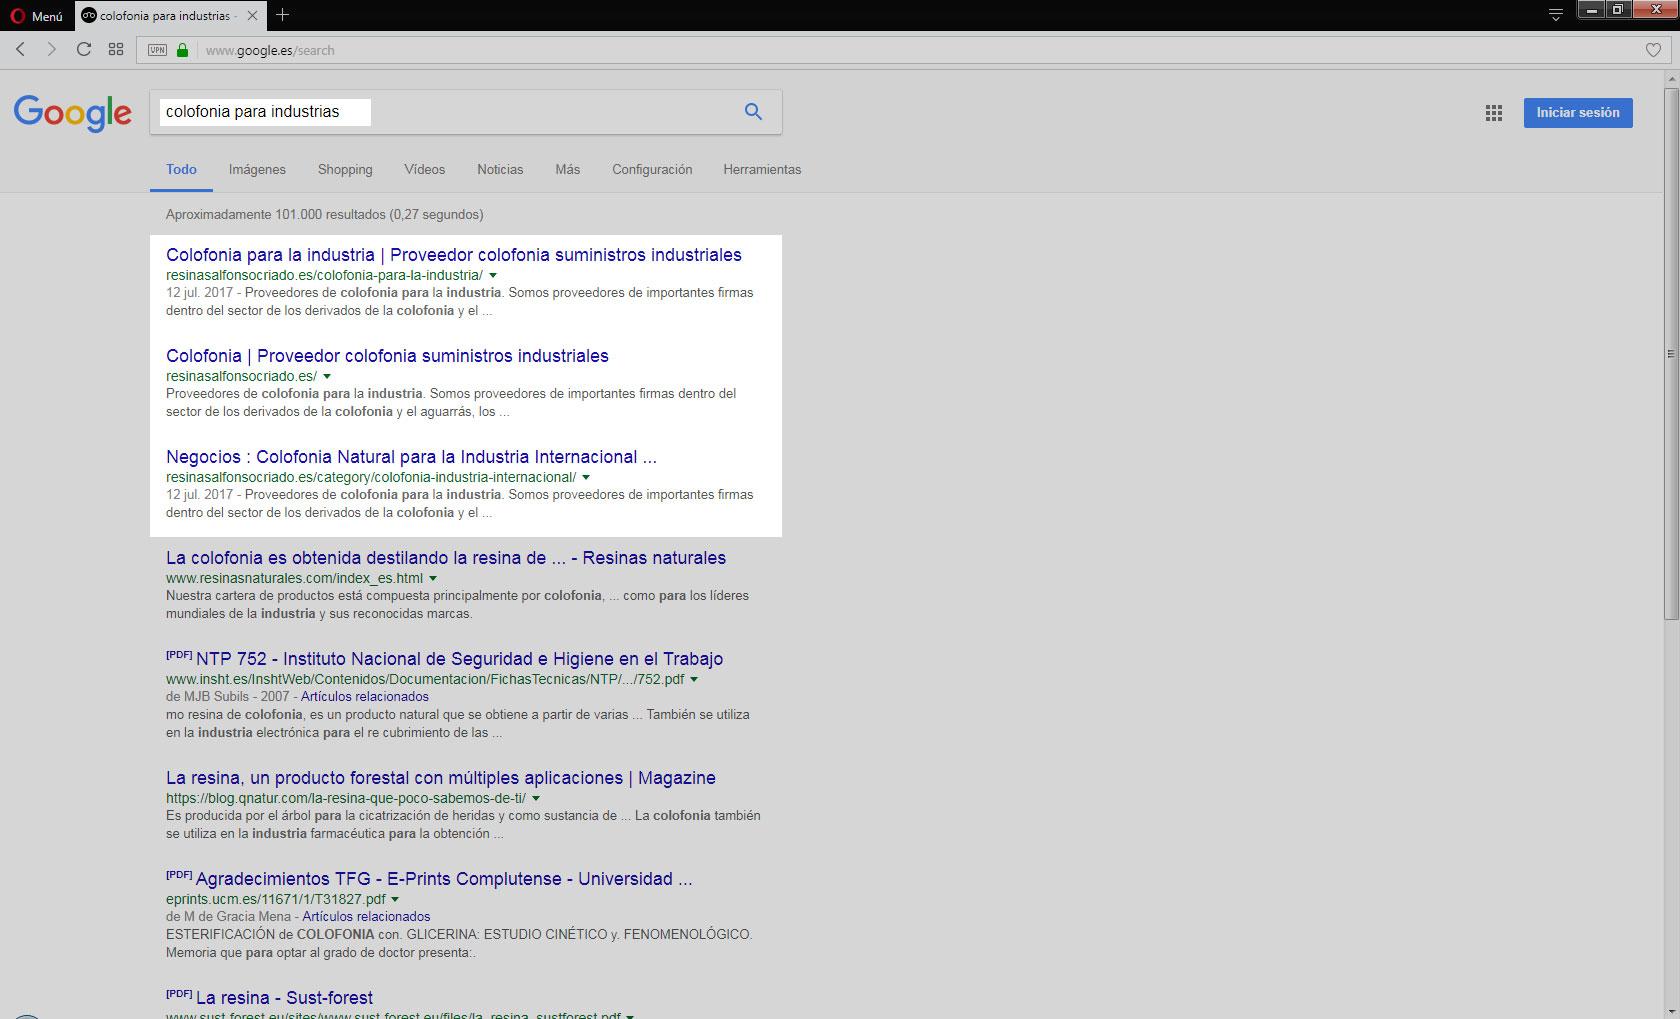 google-seo-pant-colofonia